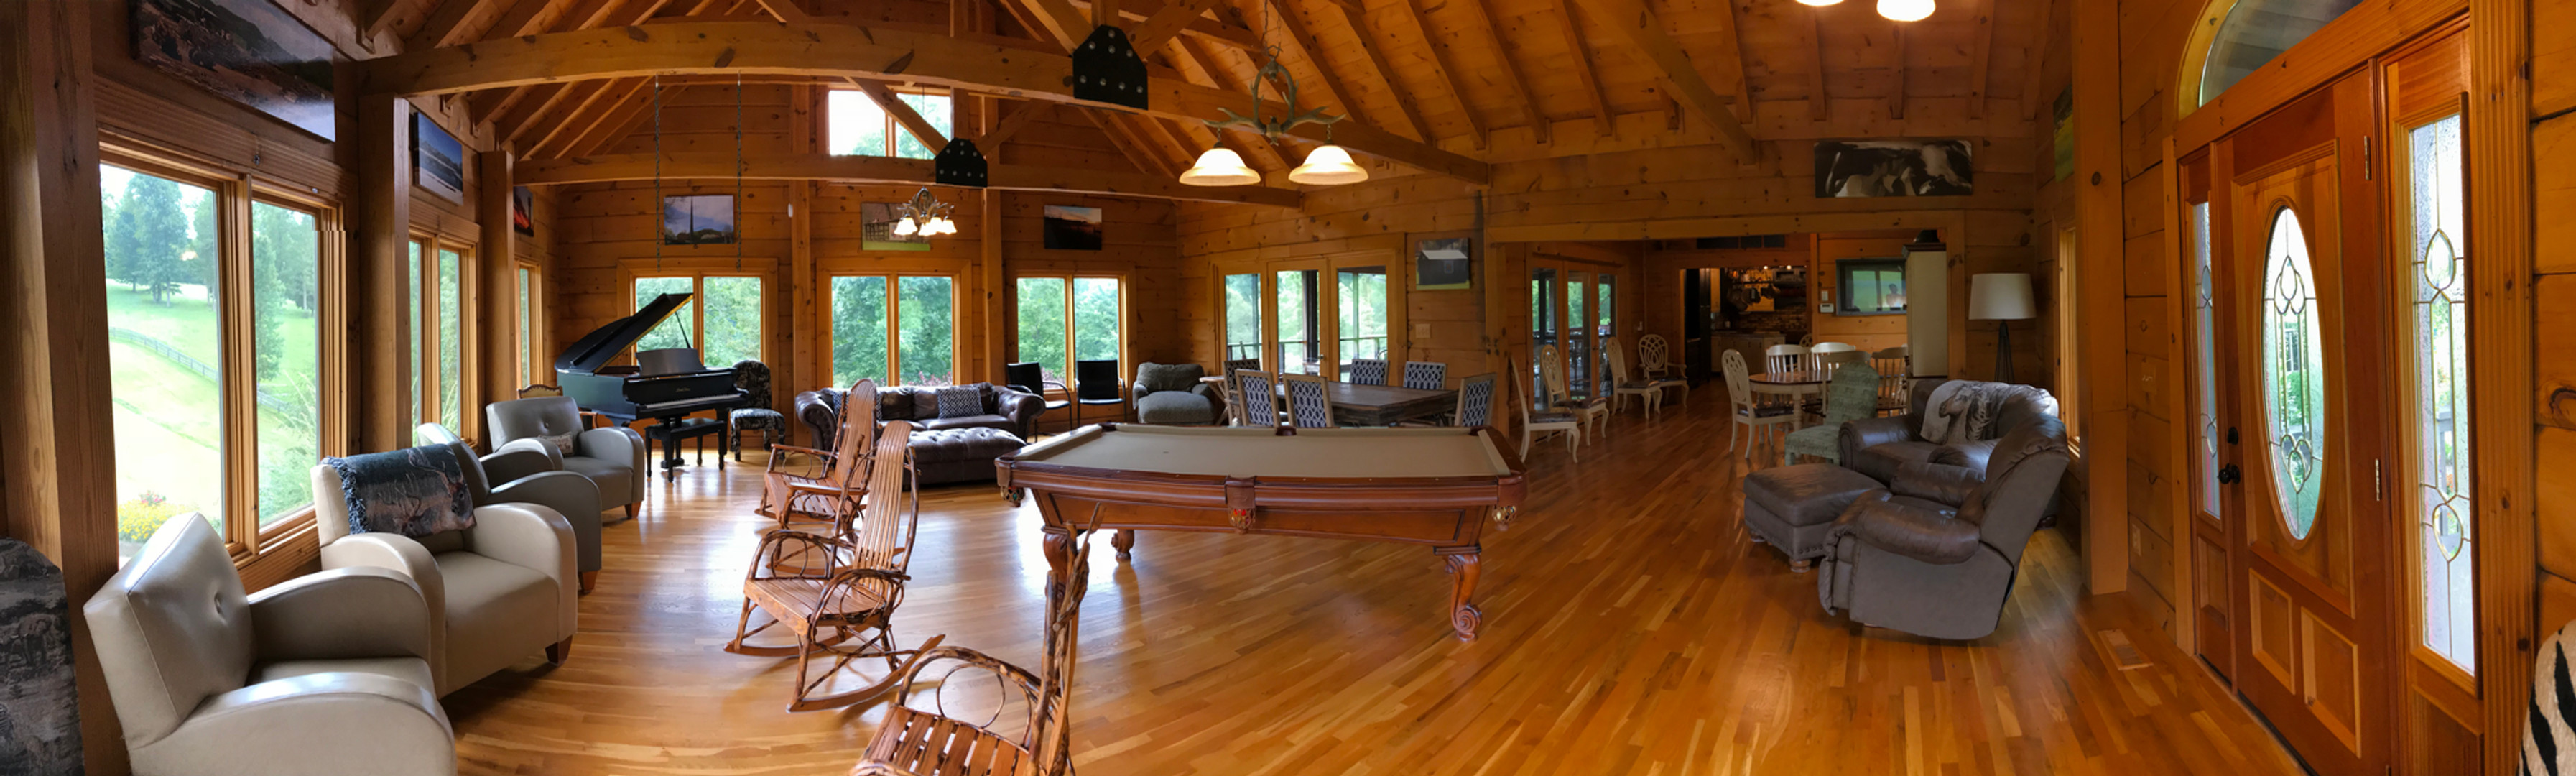 Lodge great room pool table